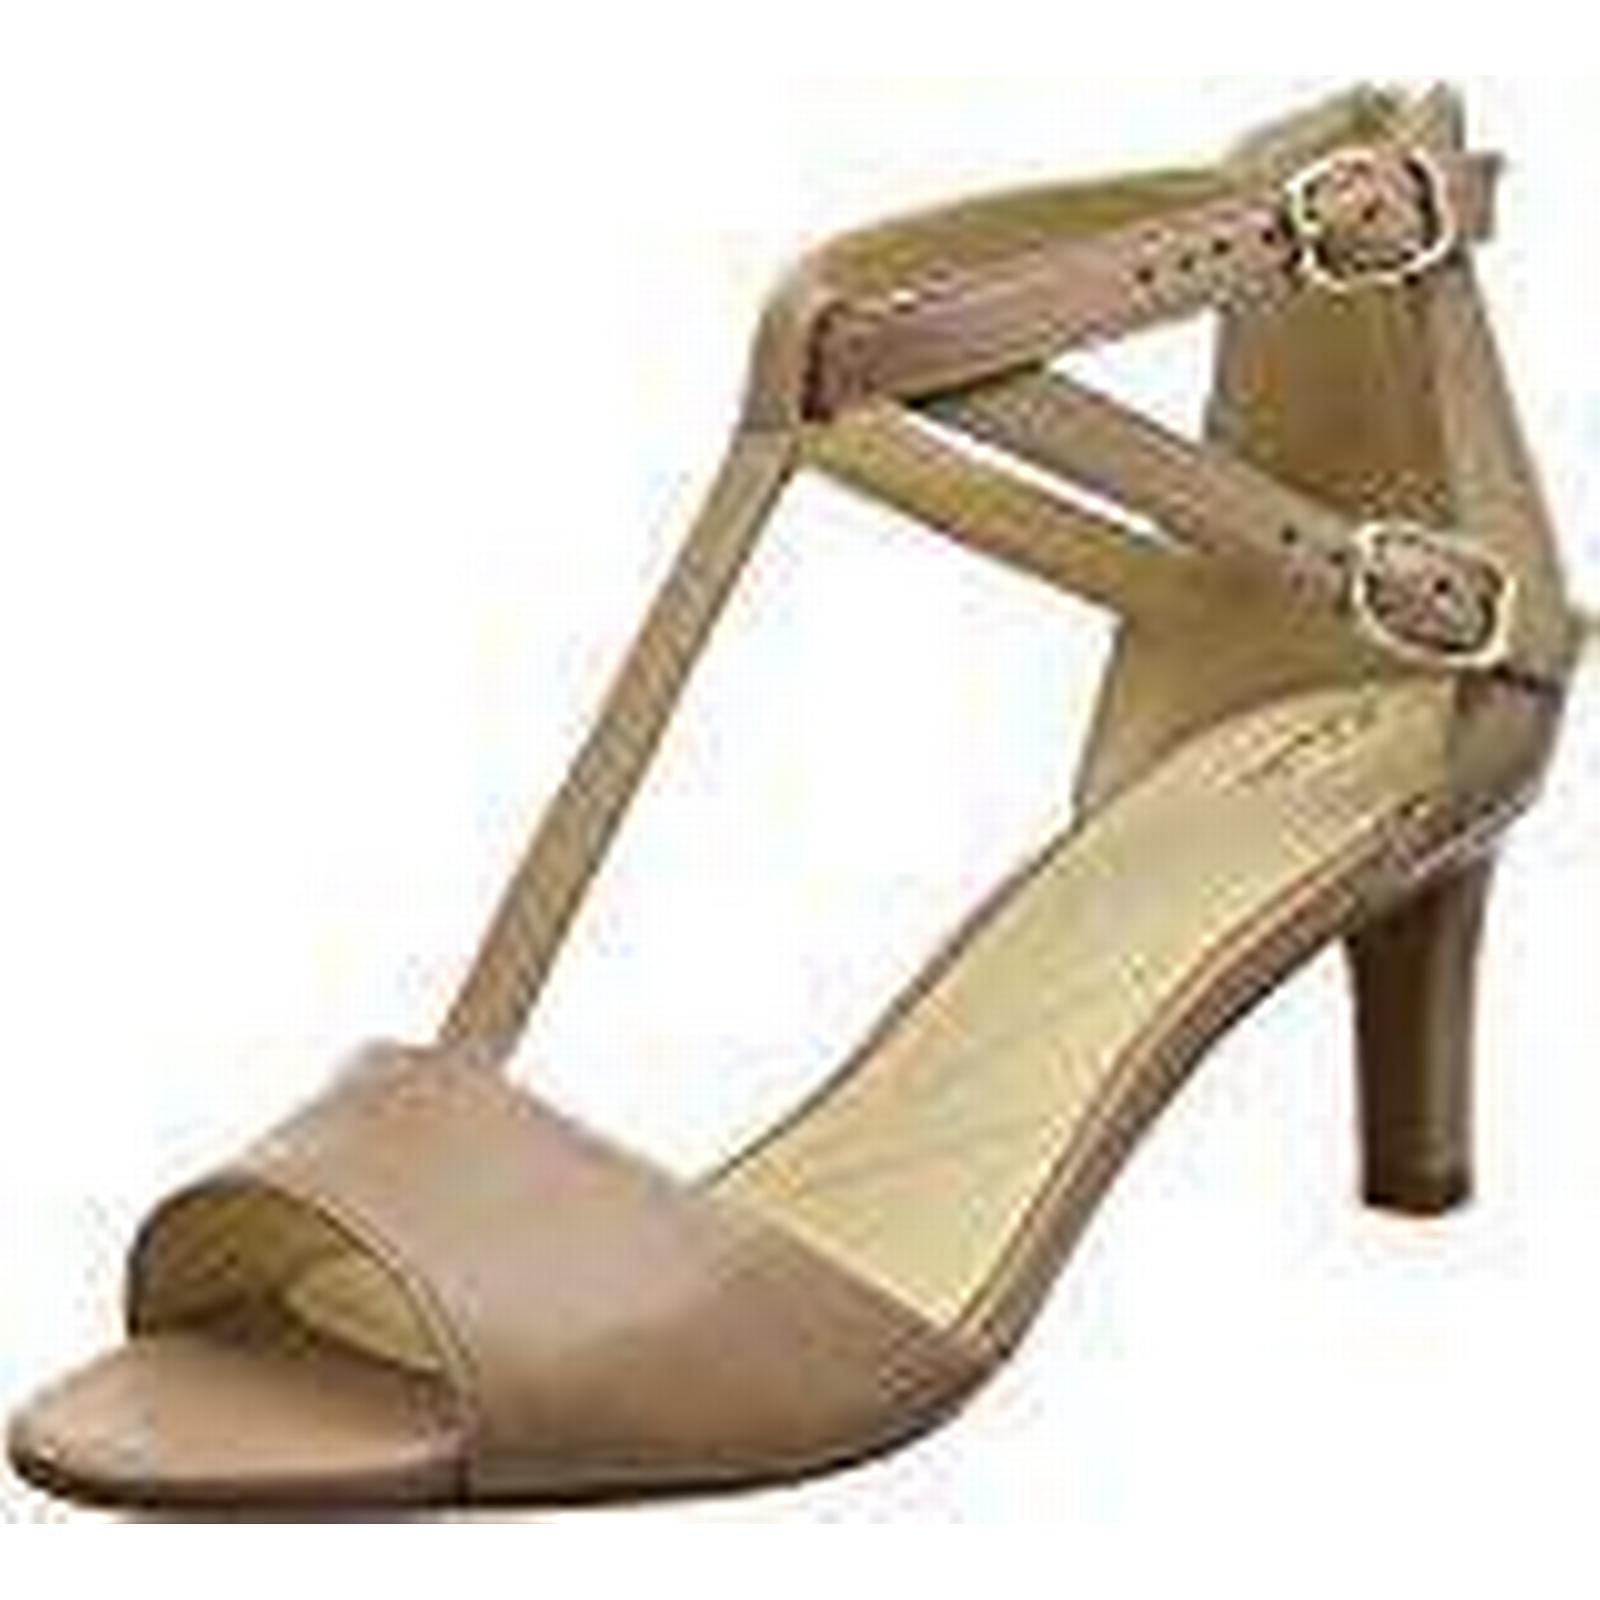 Clarks Women''s Laureti Pearl Ankle 6.5 Strap Sandals, (Beige Leather), 6.5 Ankle UK 473334